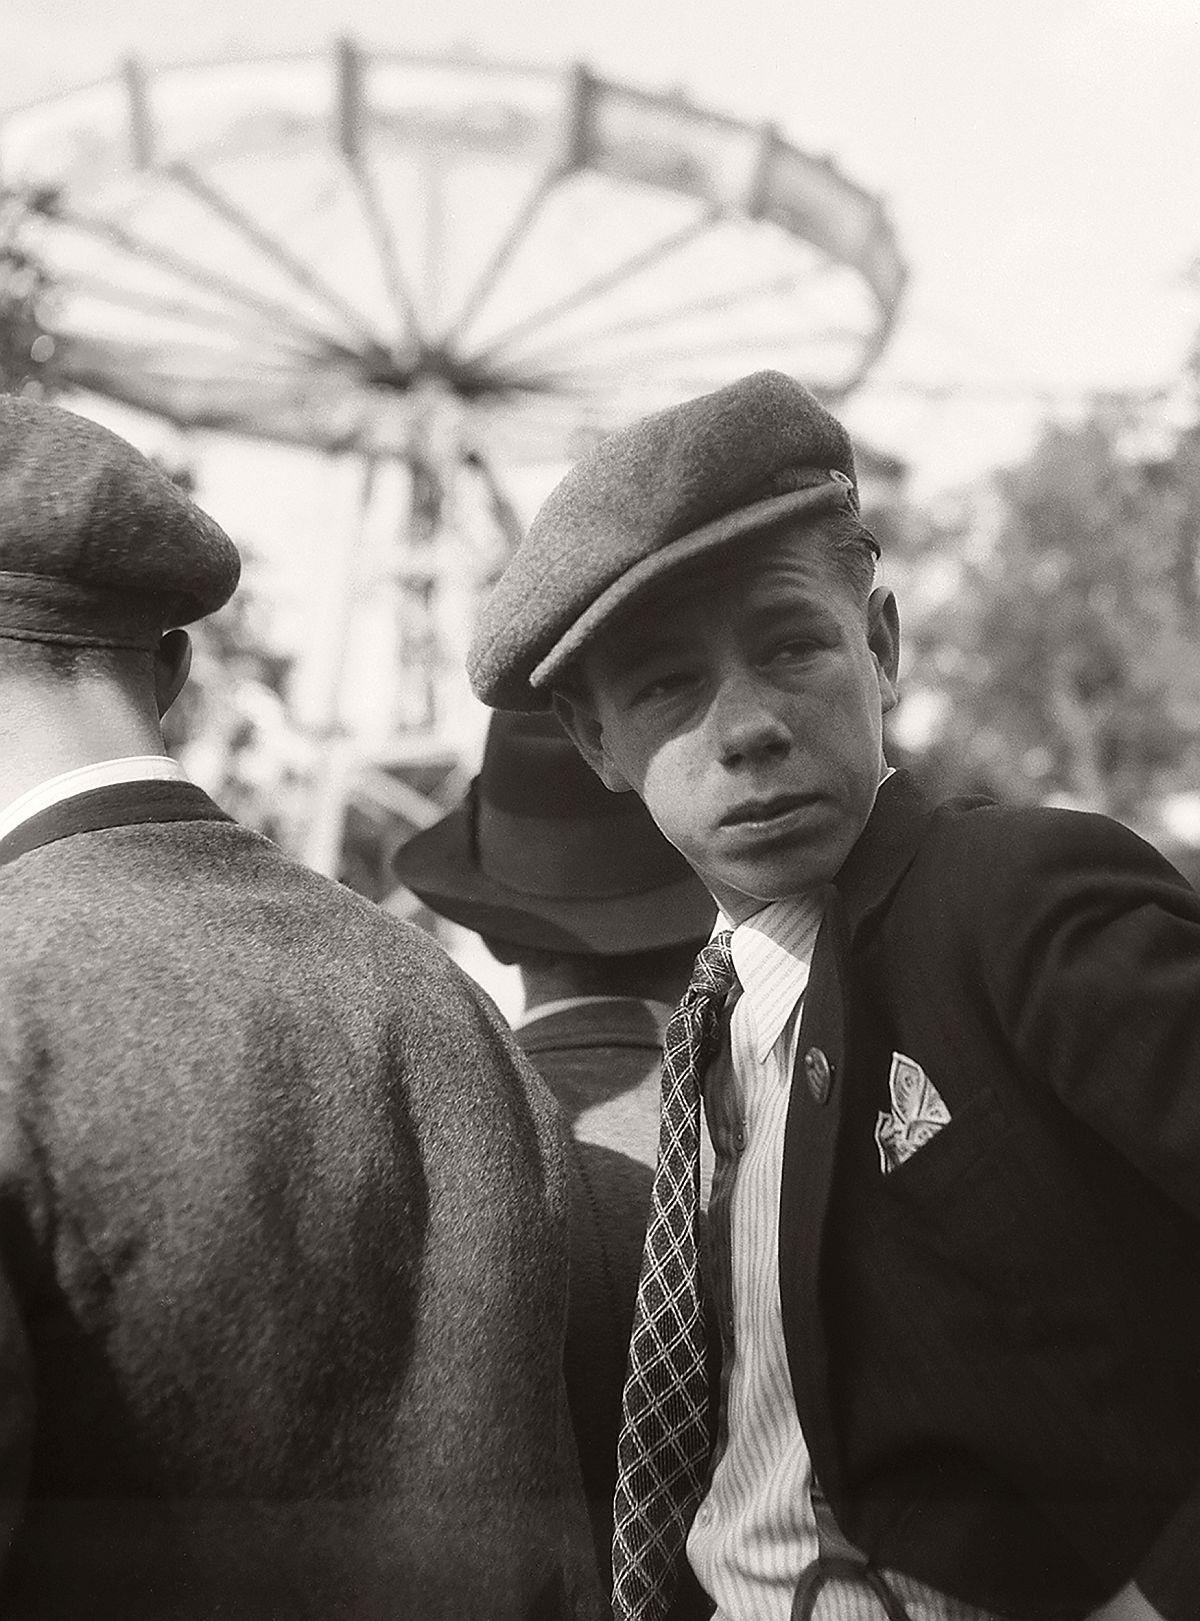 Robert Haas: In the Böhmischer Prater amusement park on the Laaer Berg, Vienna, 1938 © Wien Museum/Sammlung Robert Haas